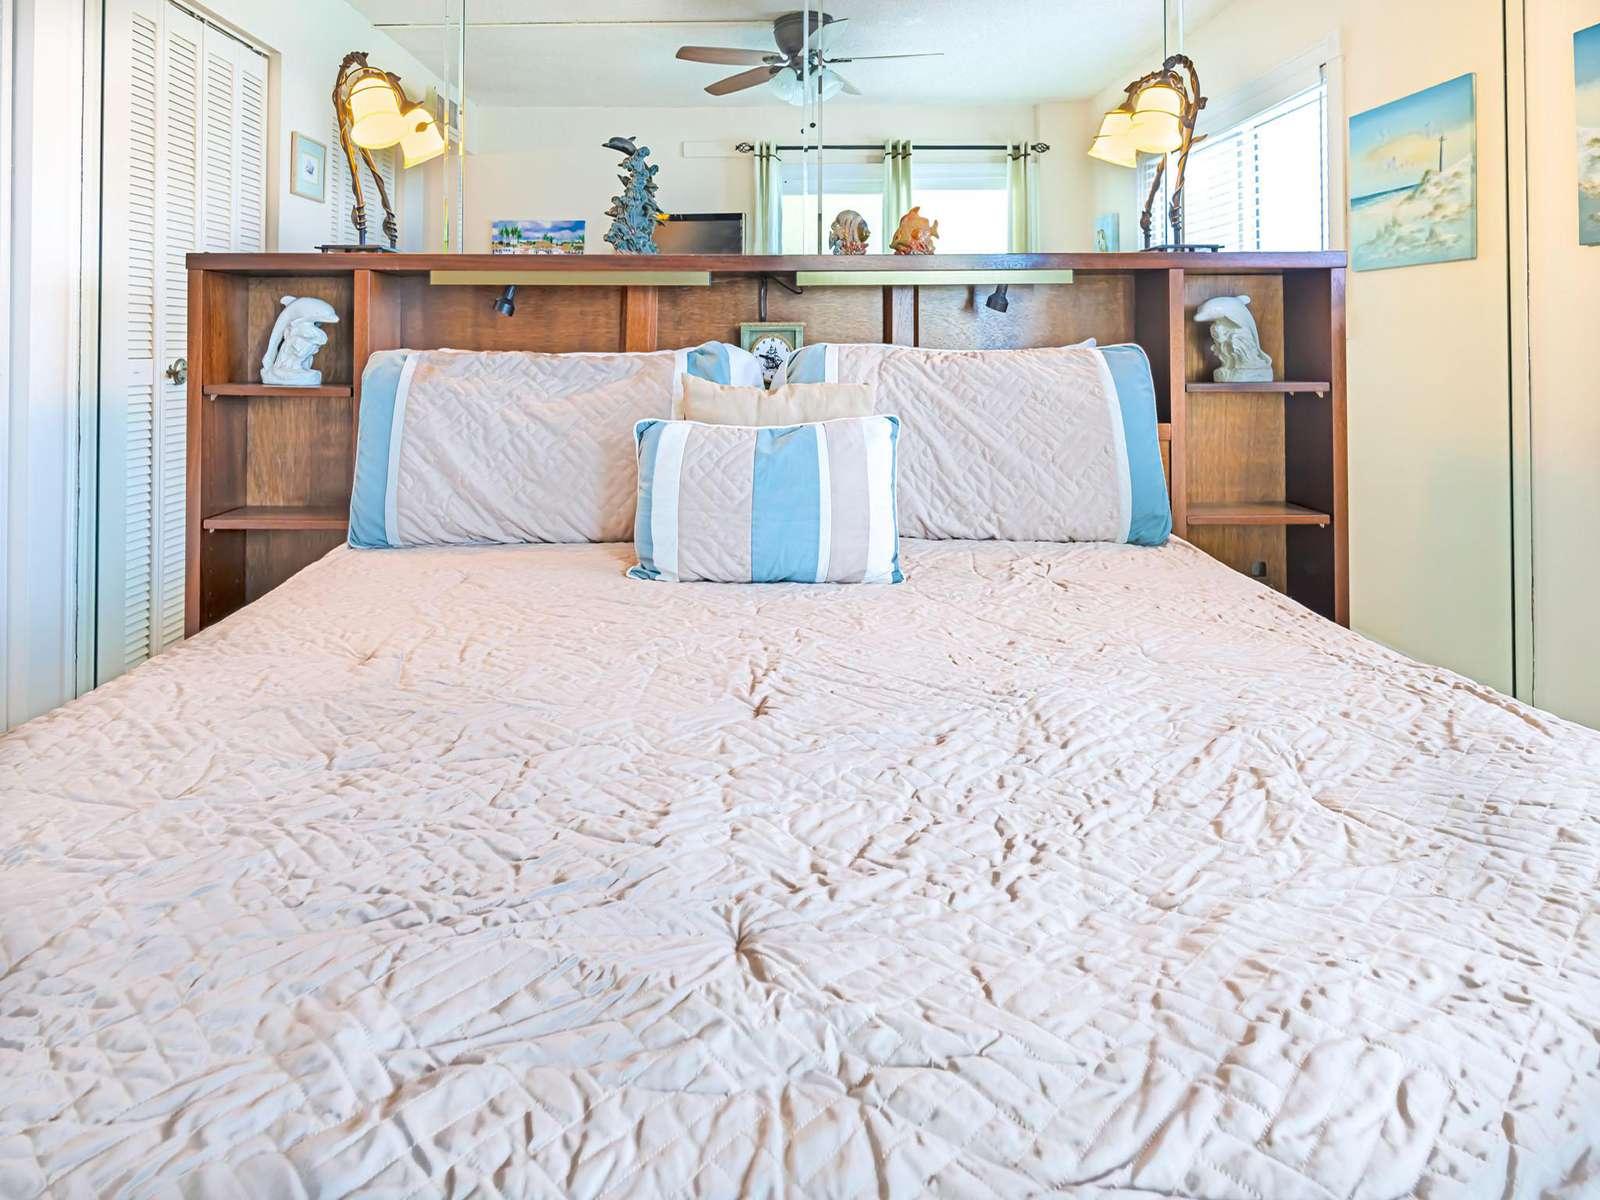 Plenty of pillows and basic linens provided!